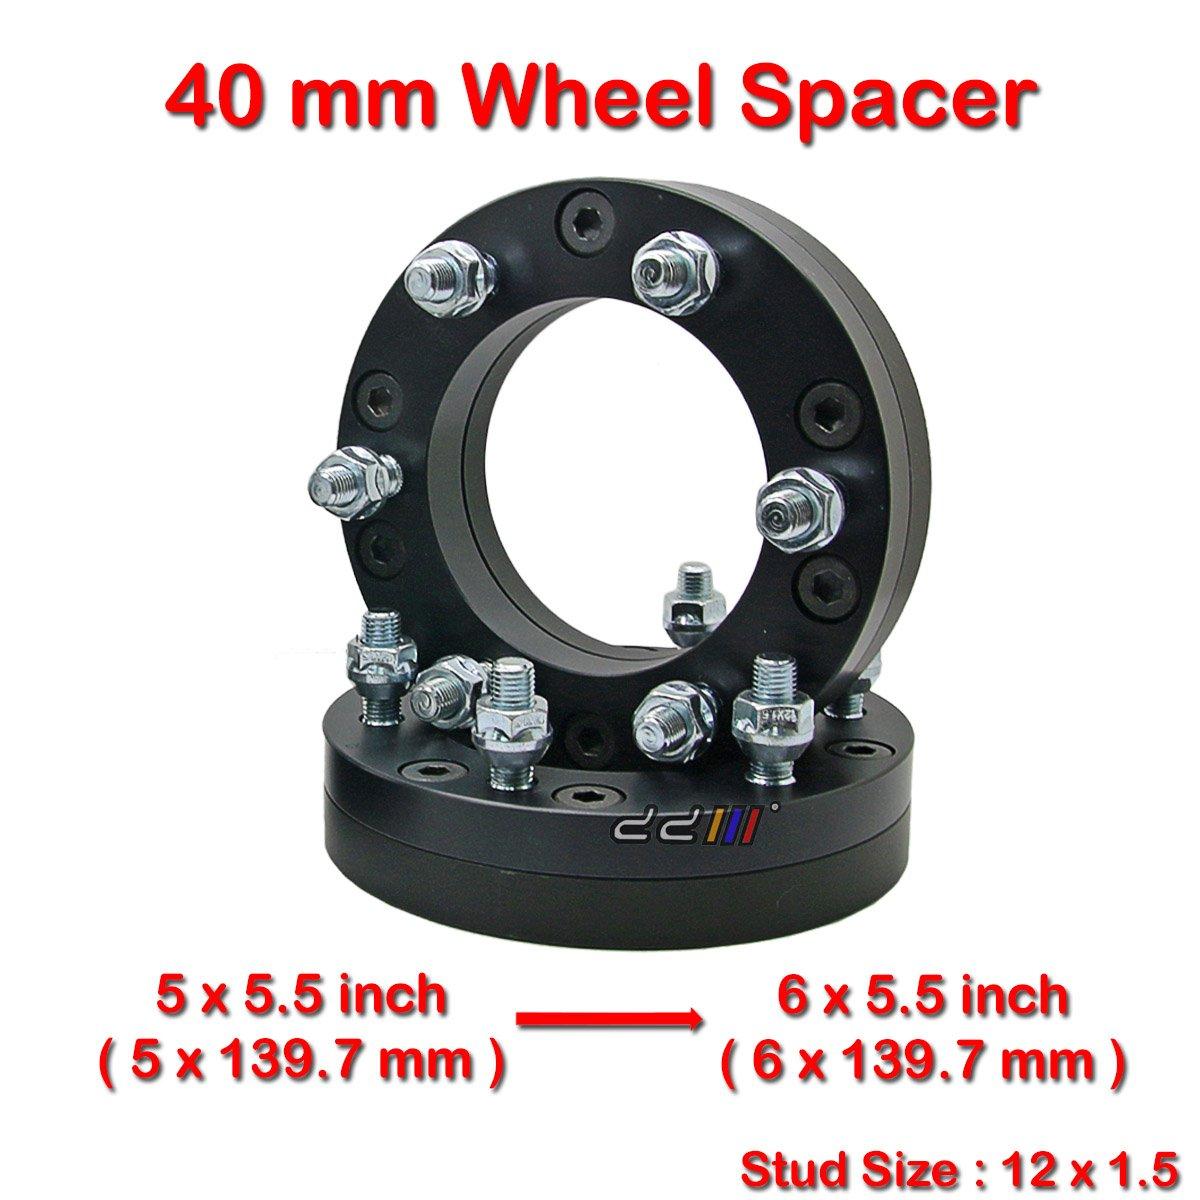 5x135mm 2pcs UNIVERSAL WHEEL SPACERS 6mm 5x139.7mm 5x130mm 6x139.7mm